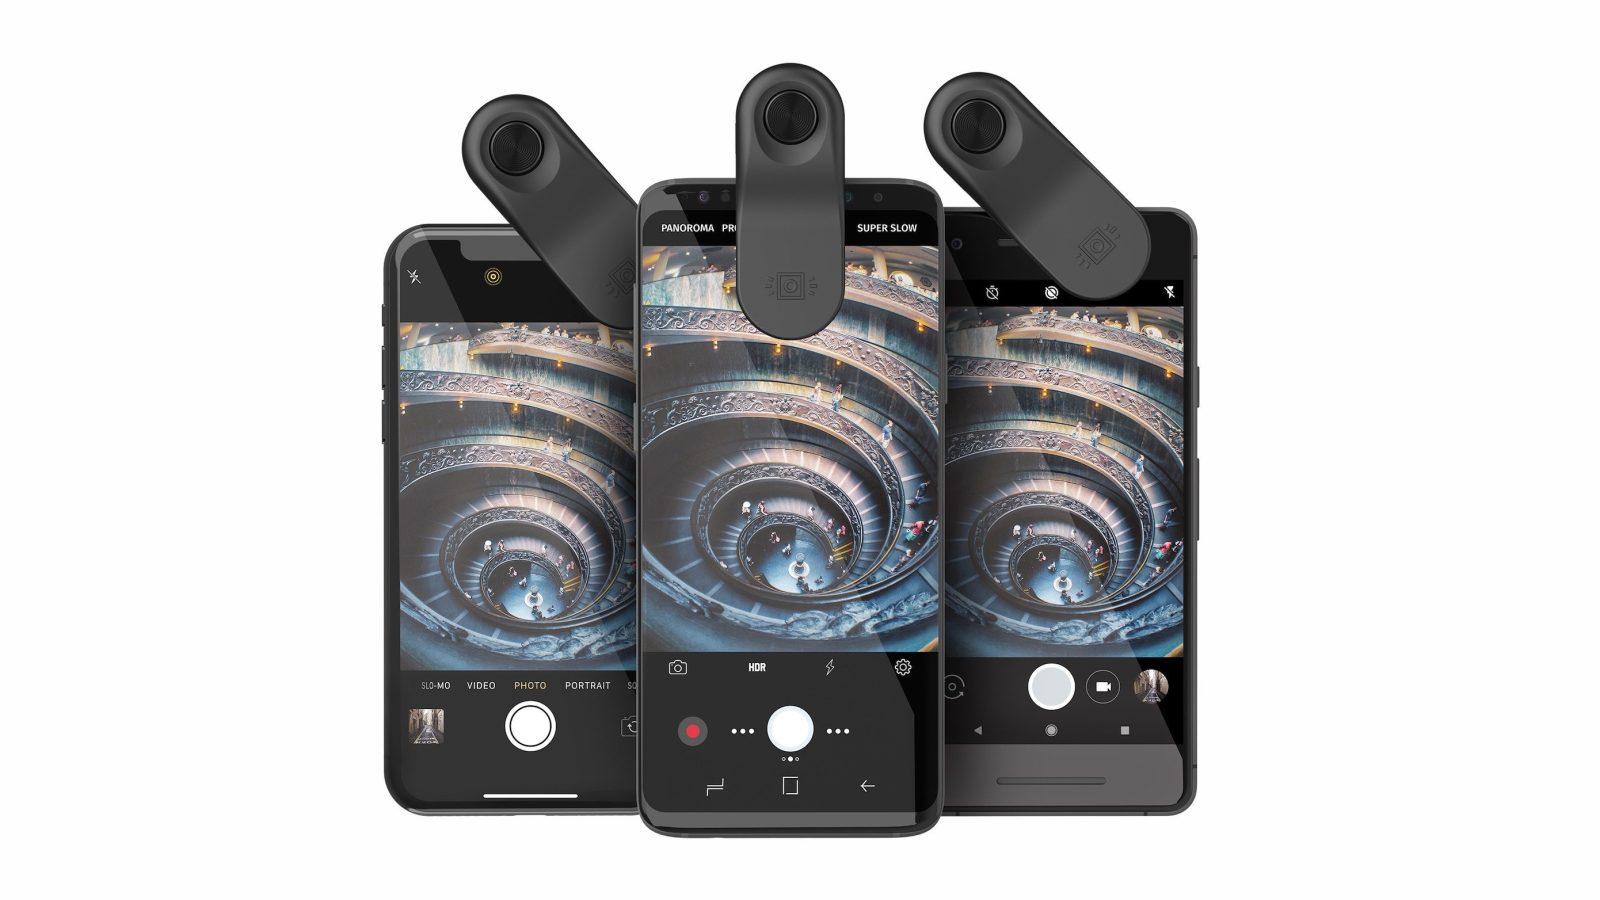 4a46e029009da7 Olloclip announces 'Multi-Device Clip' lens mount, compatible with iPhone X  and more